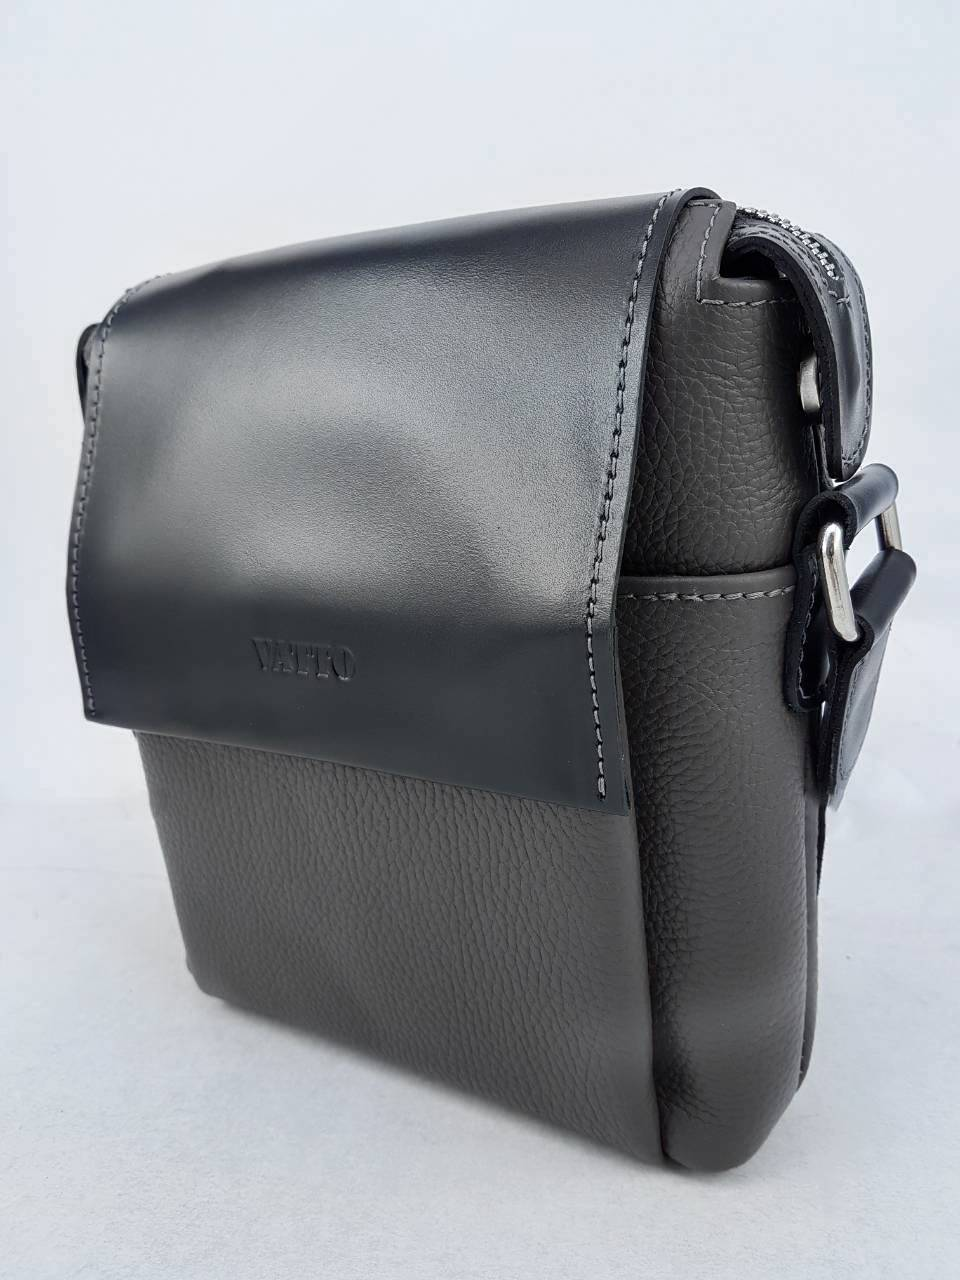 4c2b79b1961a Мужская сумка VATTO Mk41.12 F13Kаz1. Цена, купить Мужская сумка ...